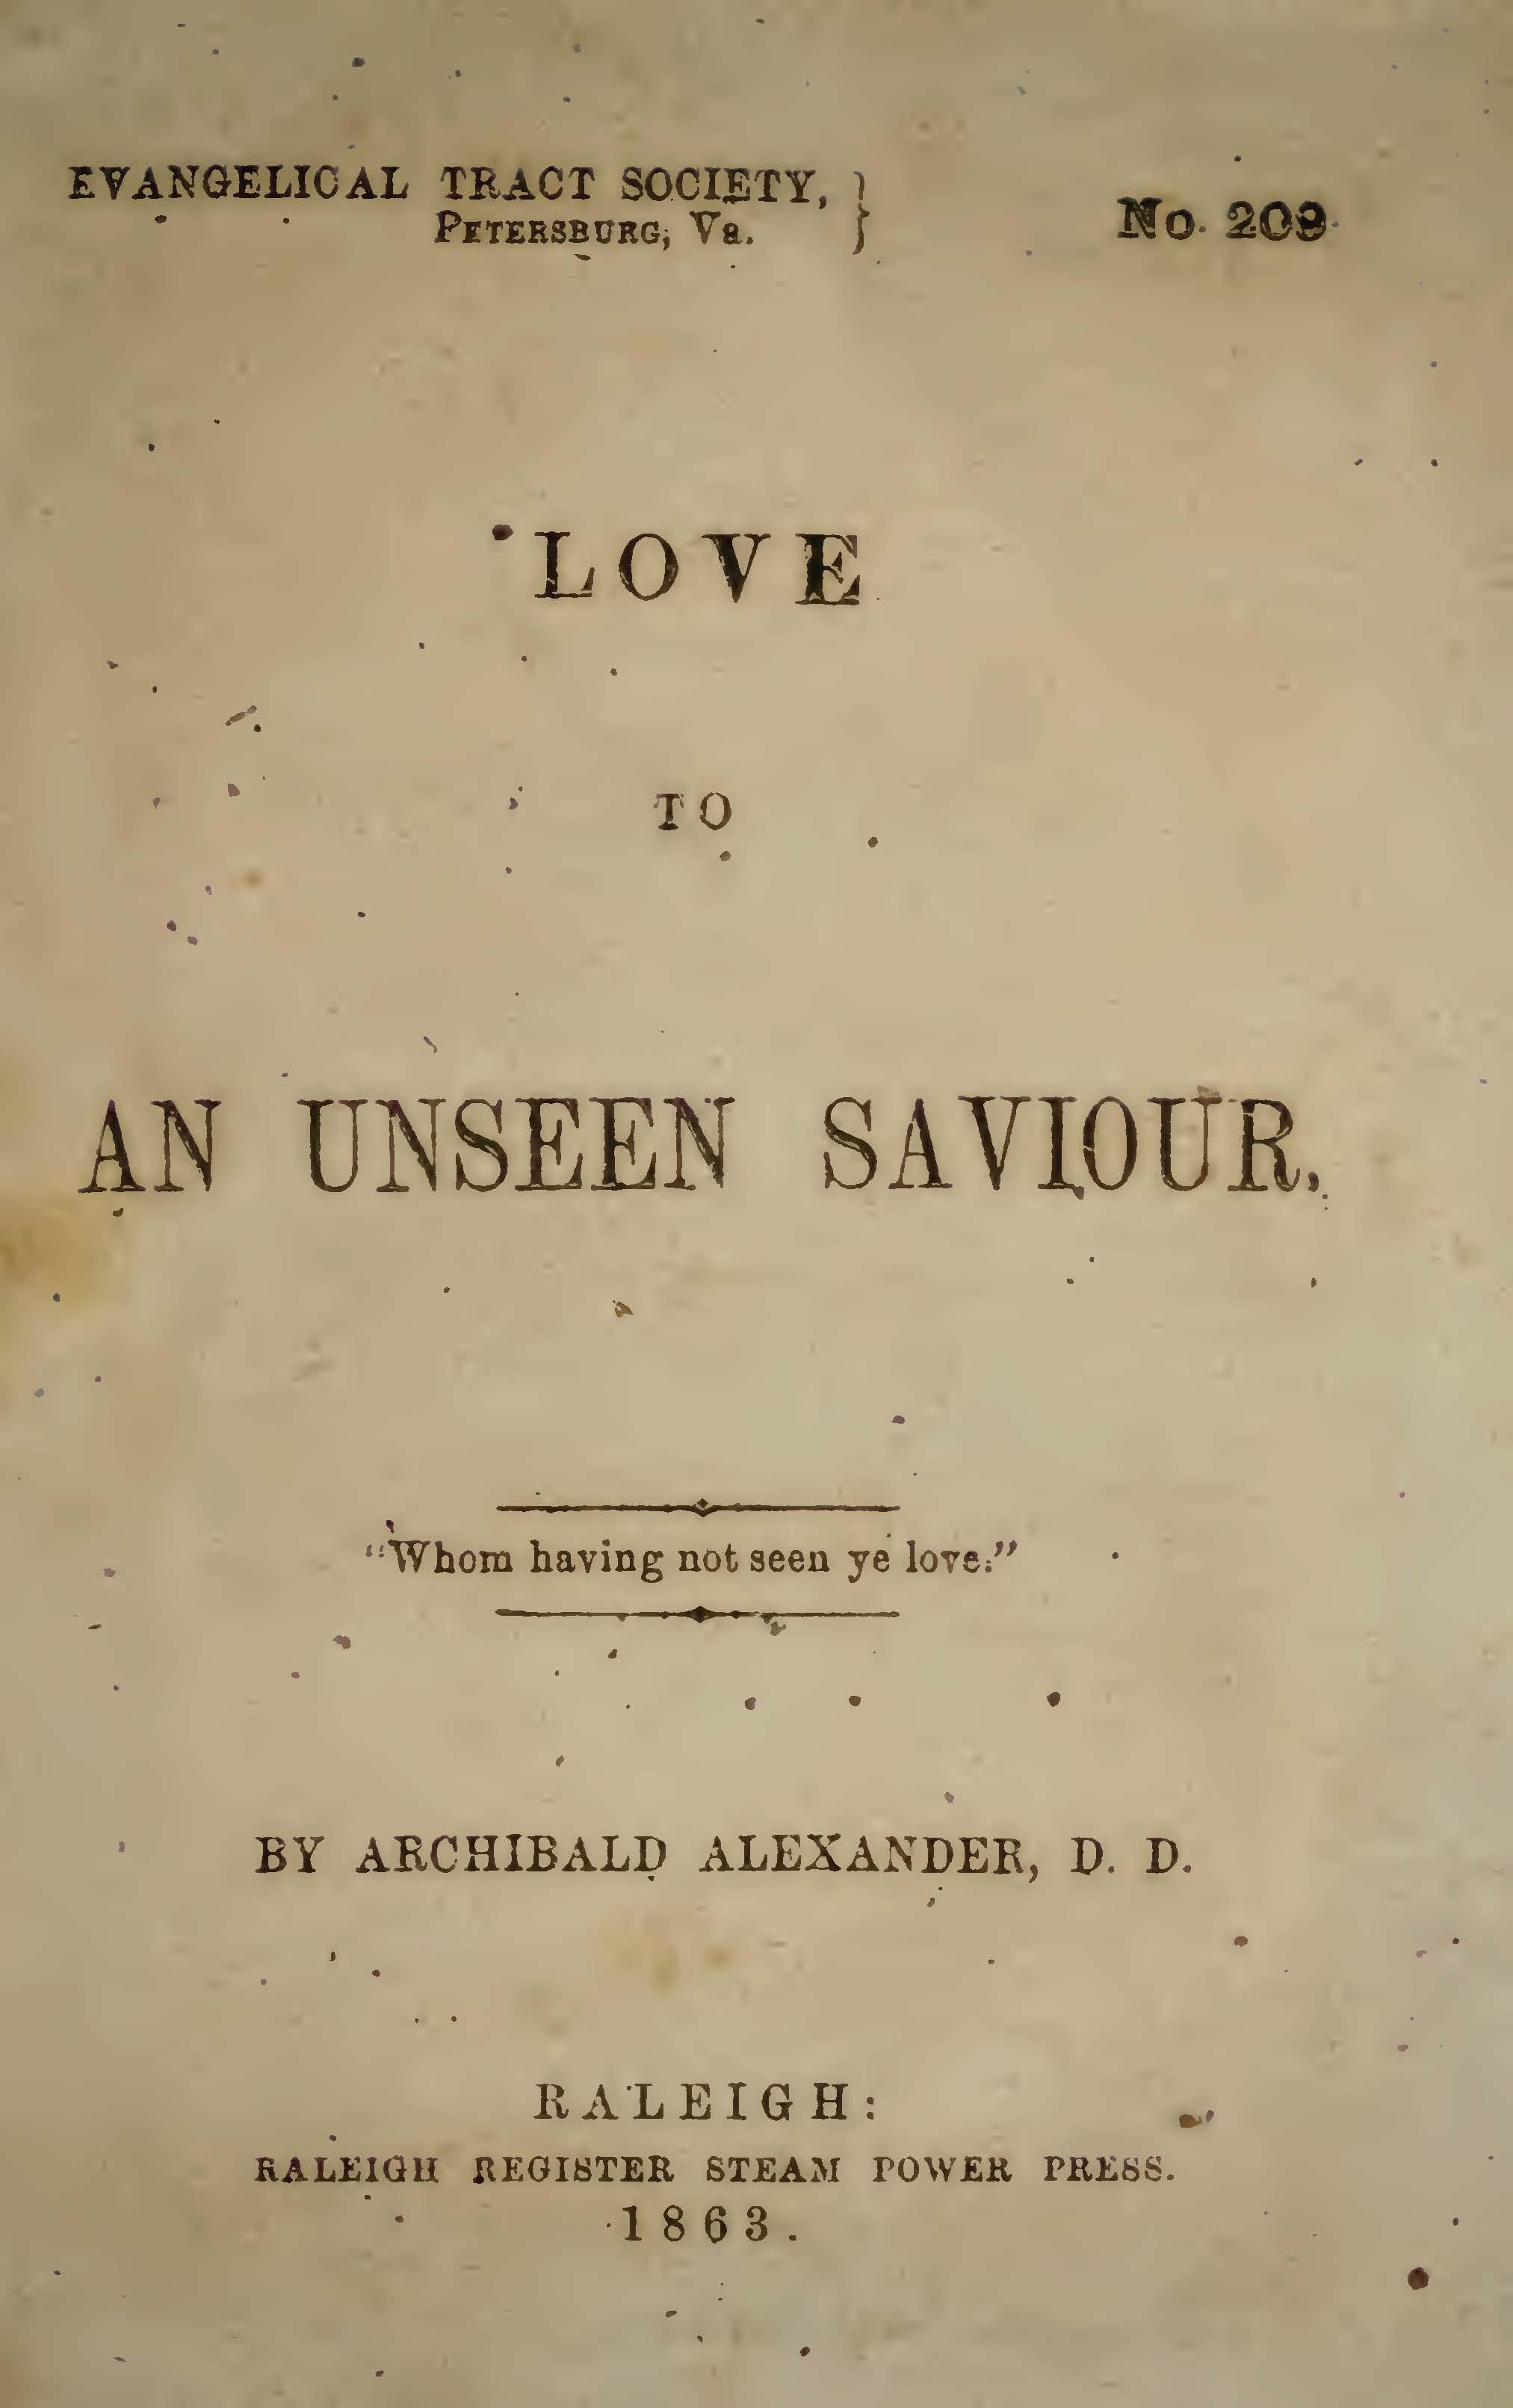 Alexander, Archibald - Love to Unseen Savior.jpg